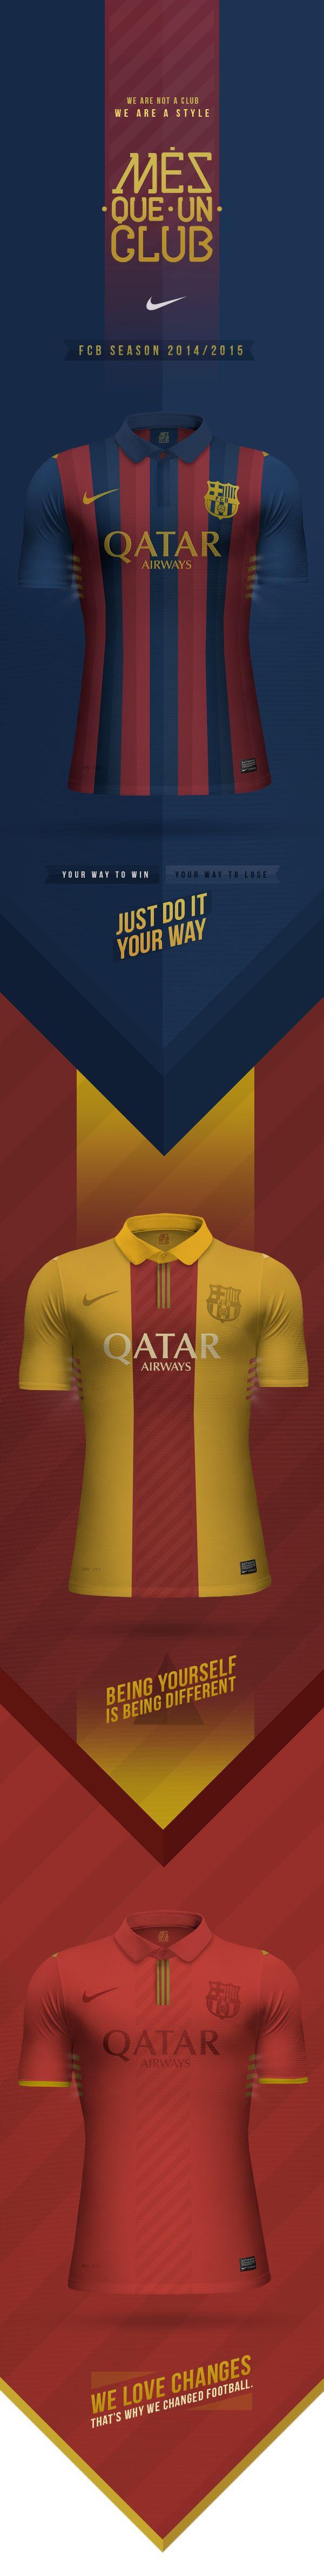 Barcelona FC - Concept by E S, via Behance